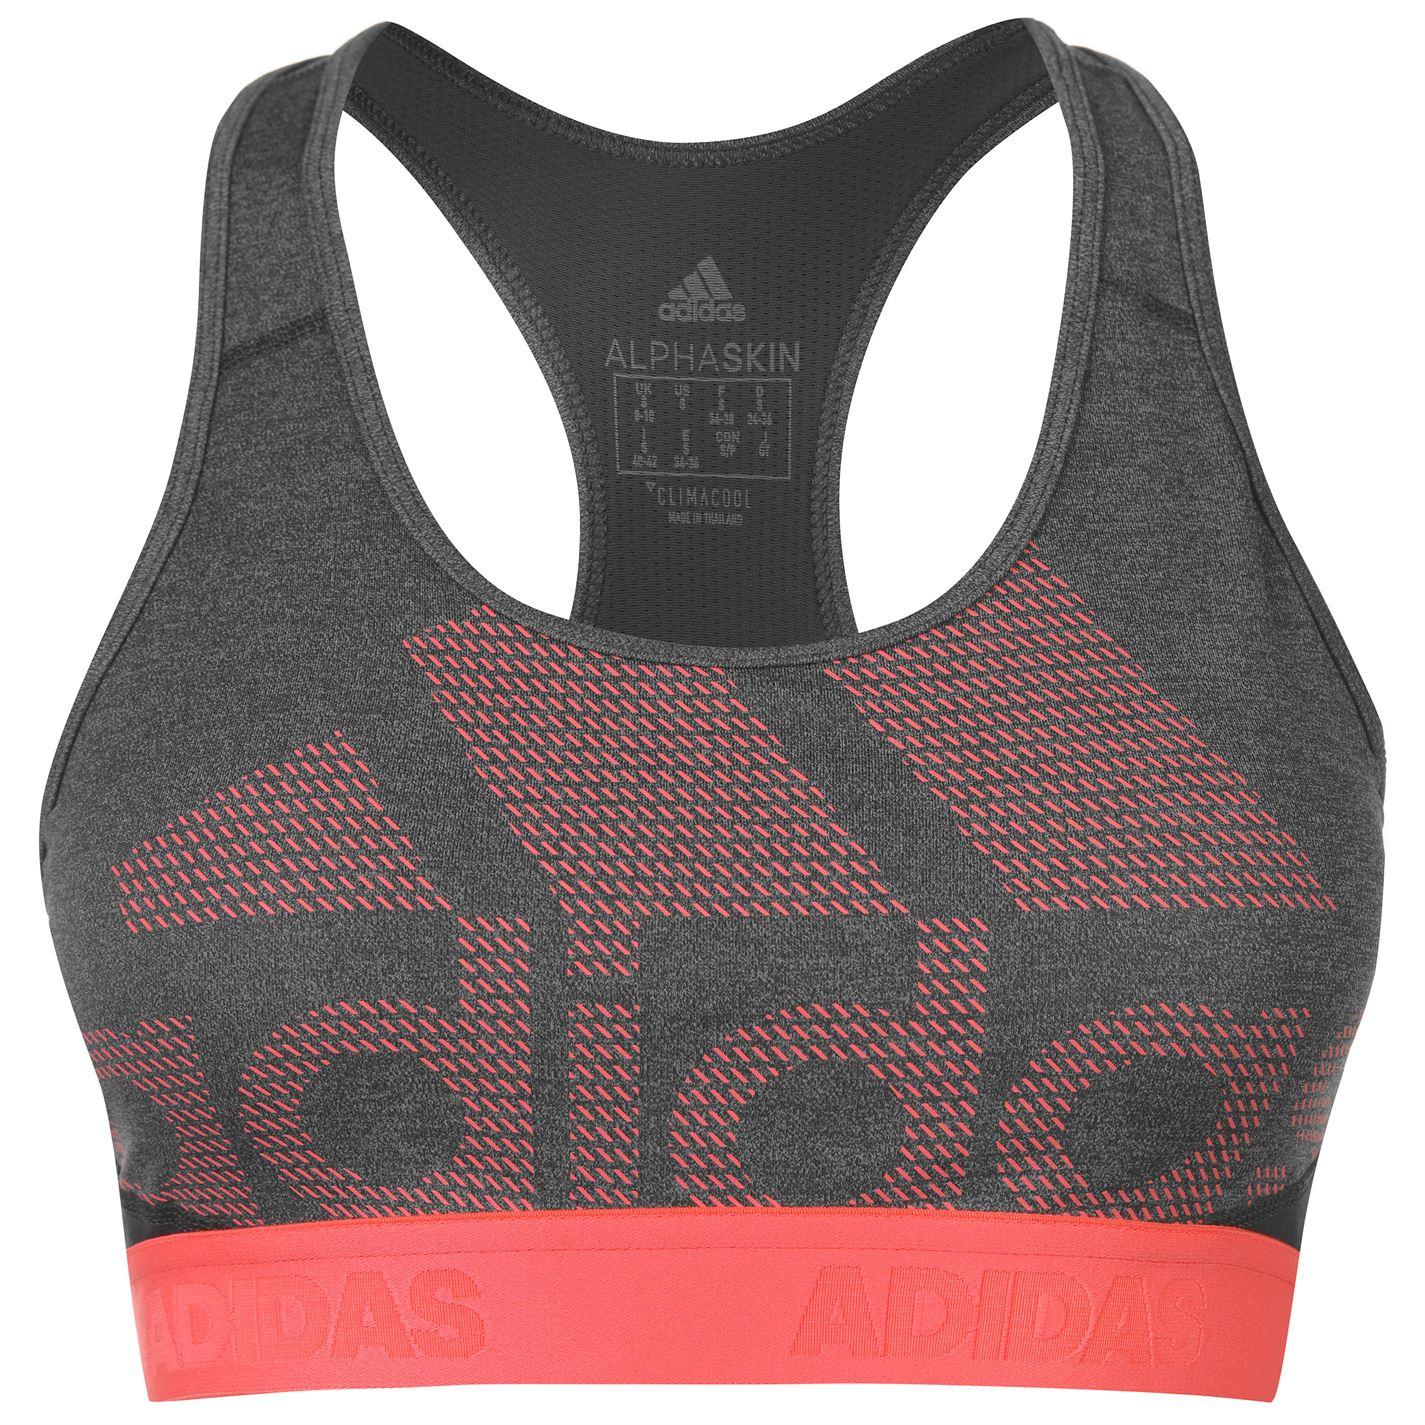 Adidas Alphaskin Logo Bra Ladies